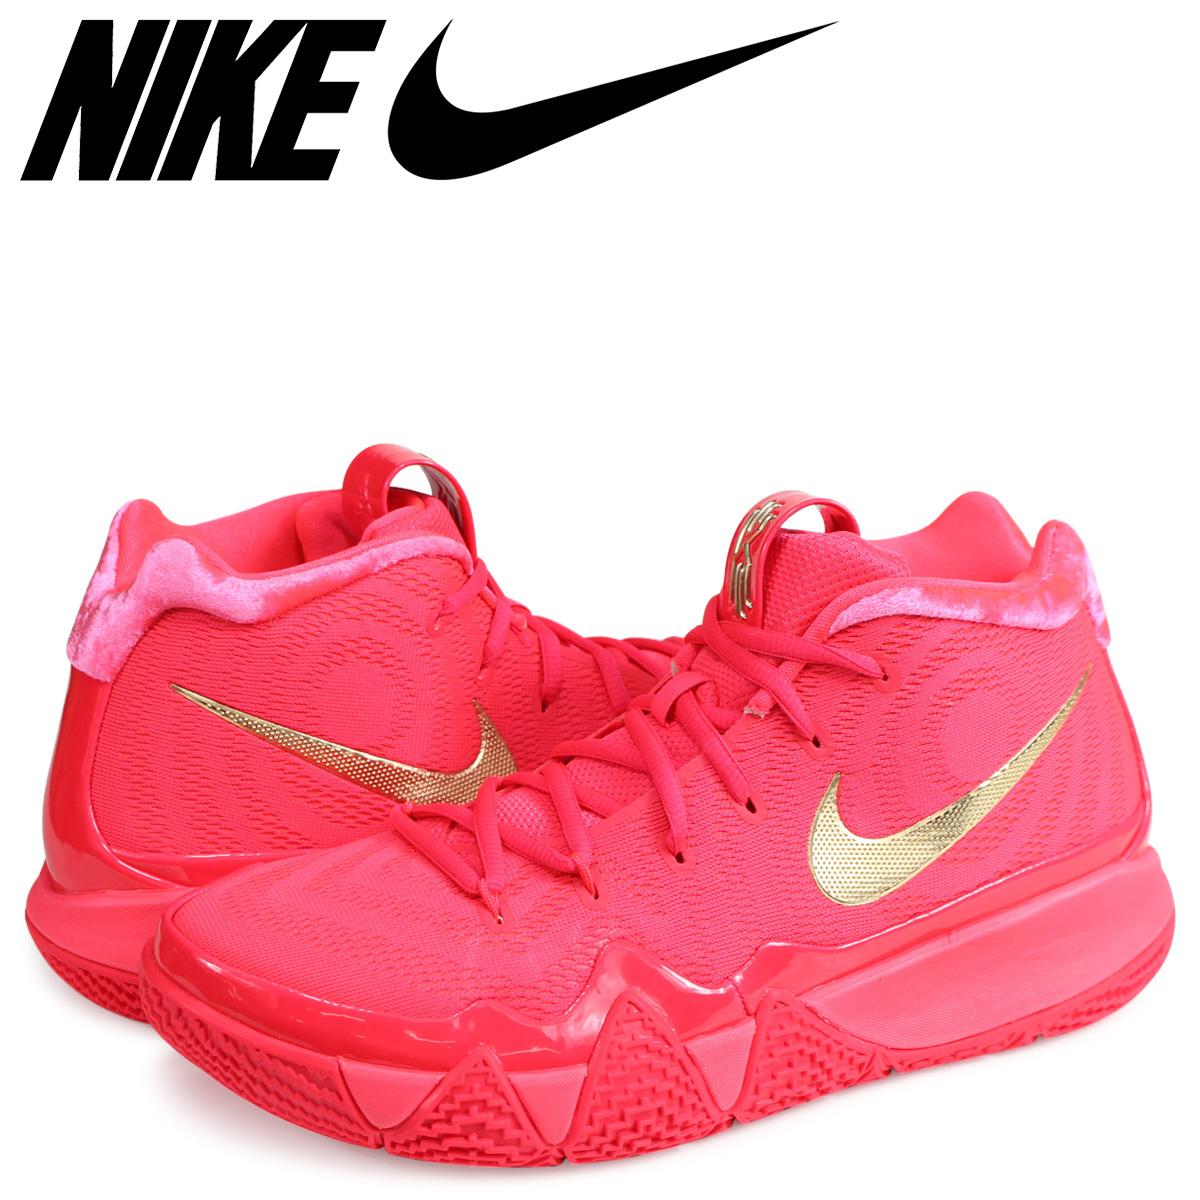 01db5ba7bb62 ALLSPORTS  NIKE KYRIE 4 EP RED CARPET Nike chi Lee 4 sneakers men ...